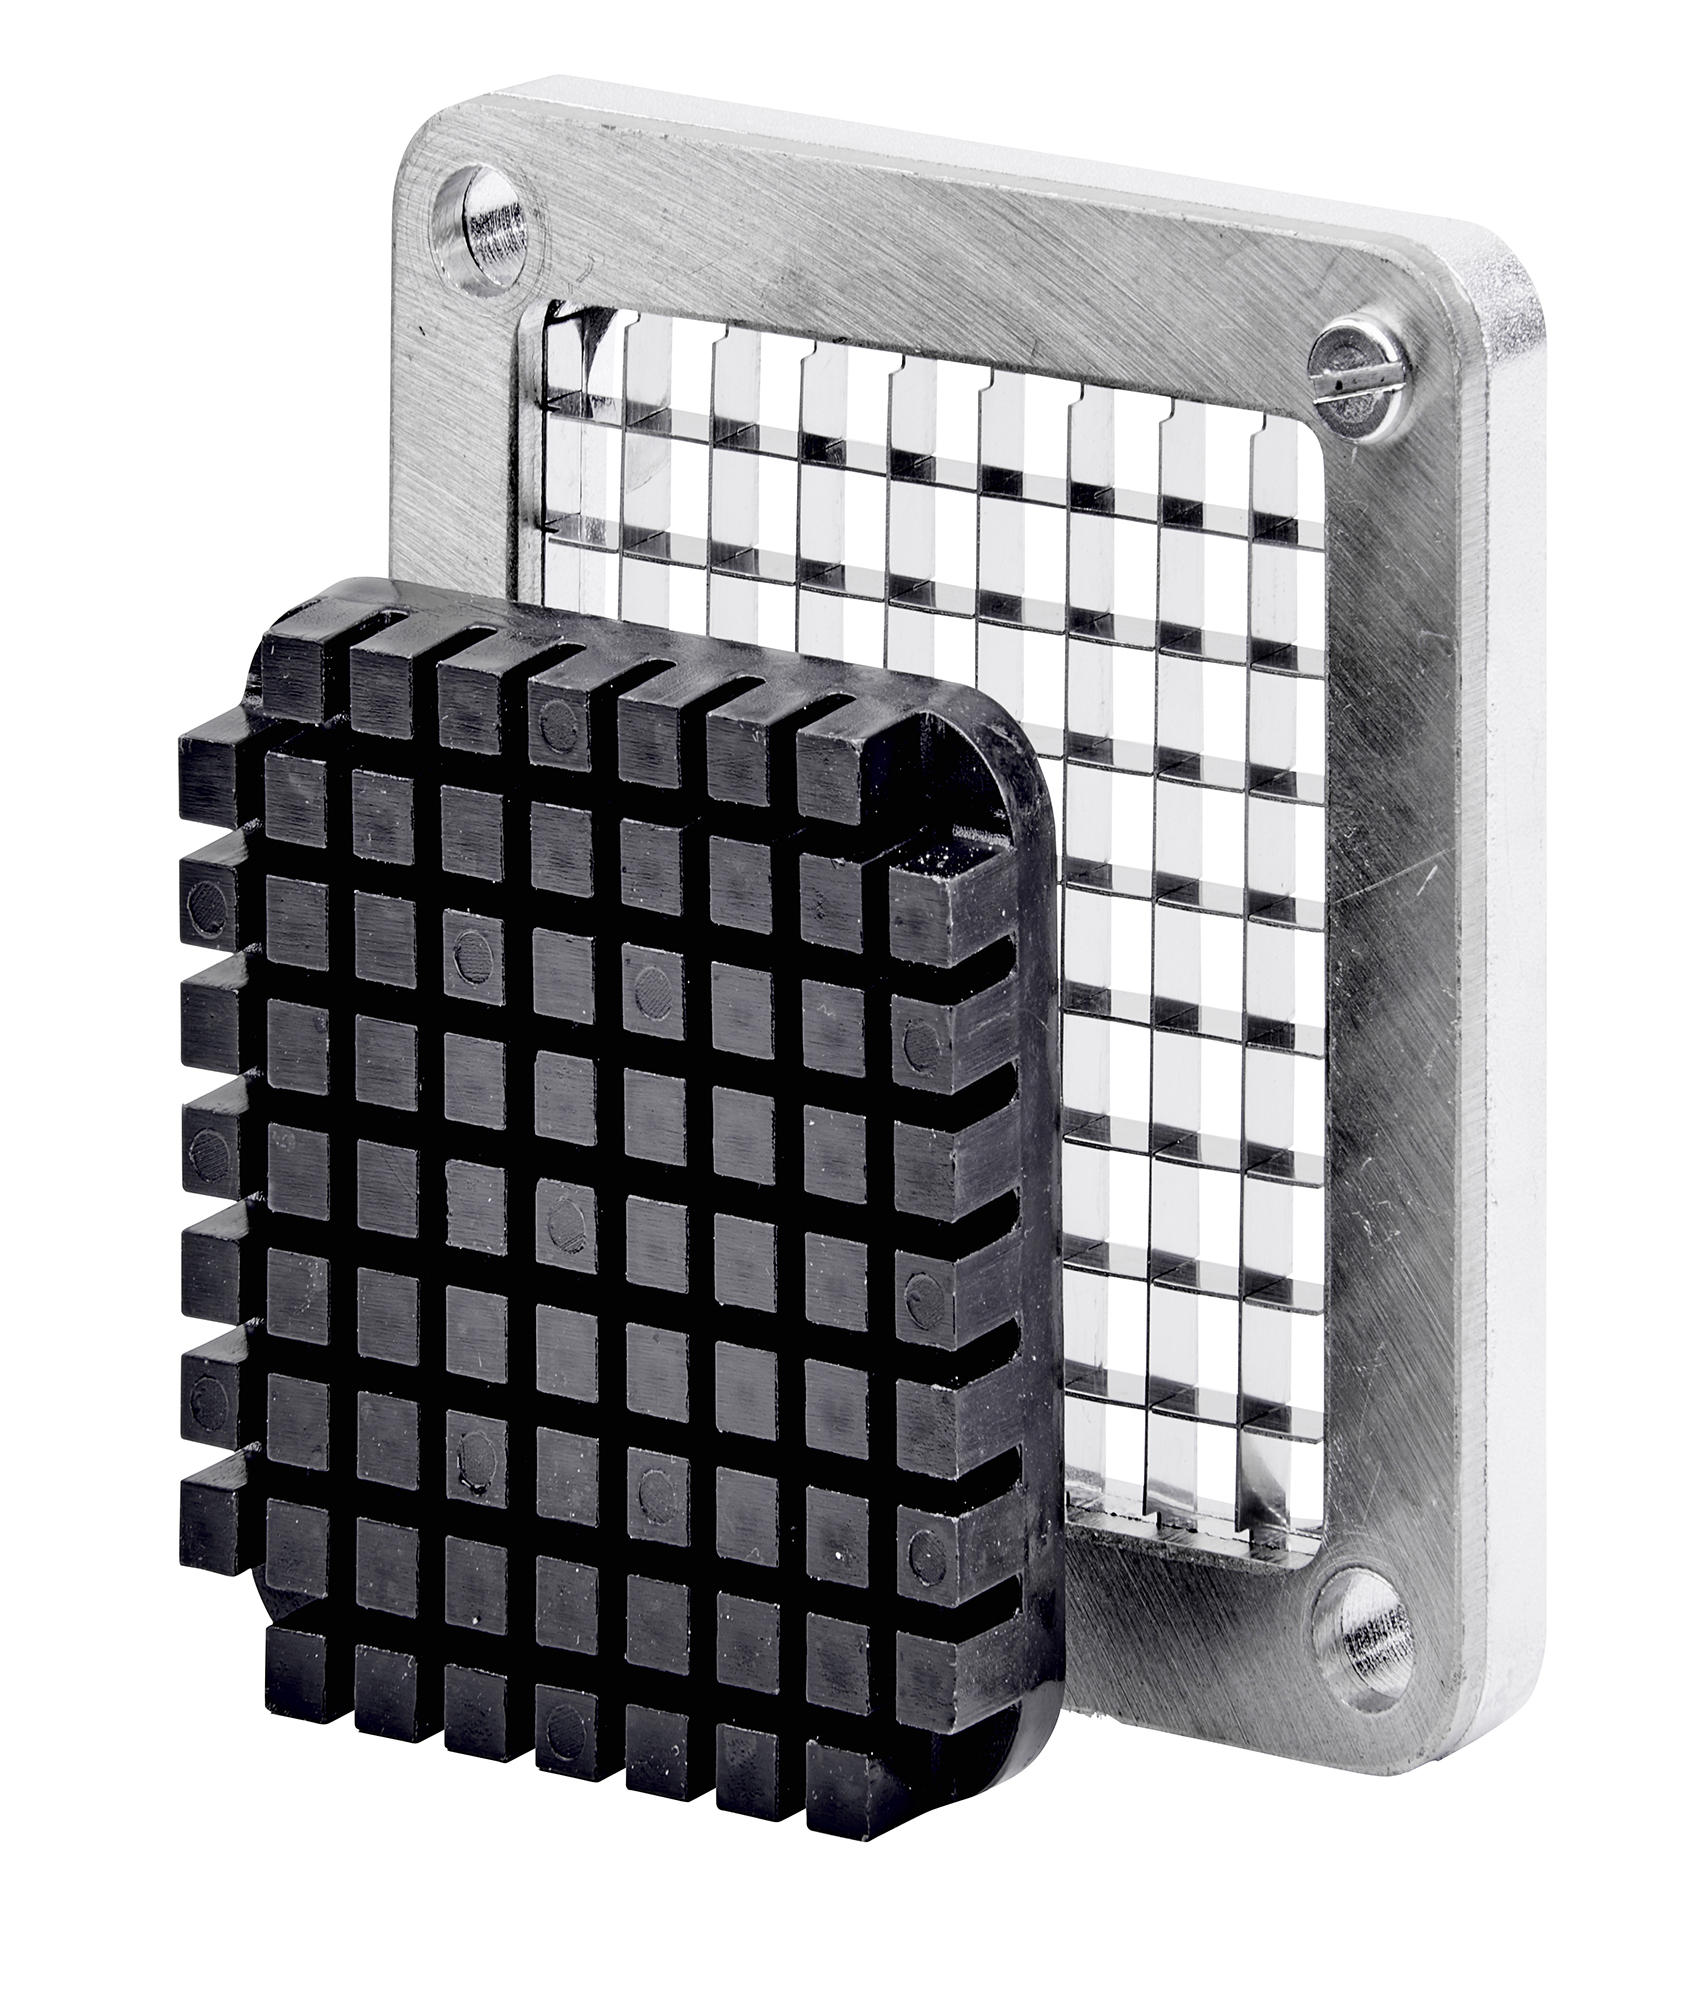 Winco HCD-375BK countertop manual prep tools